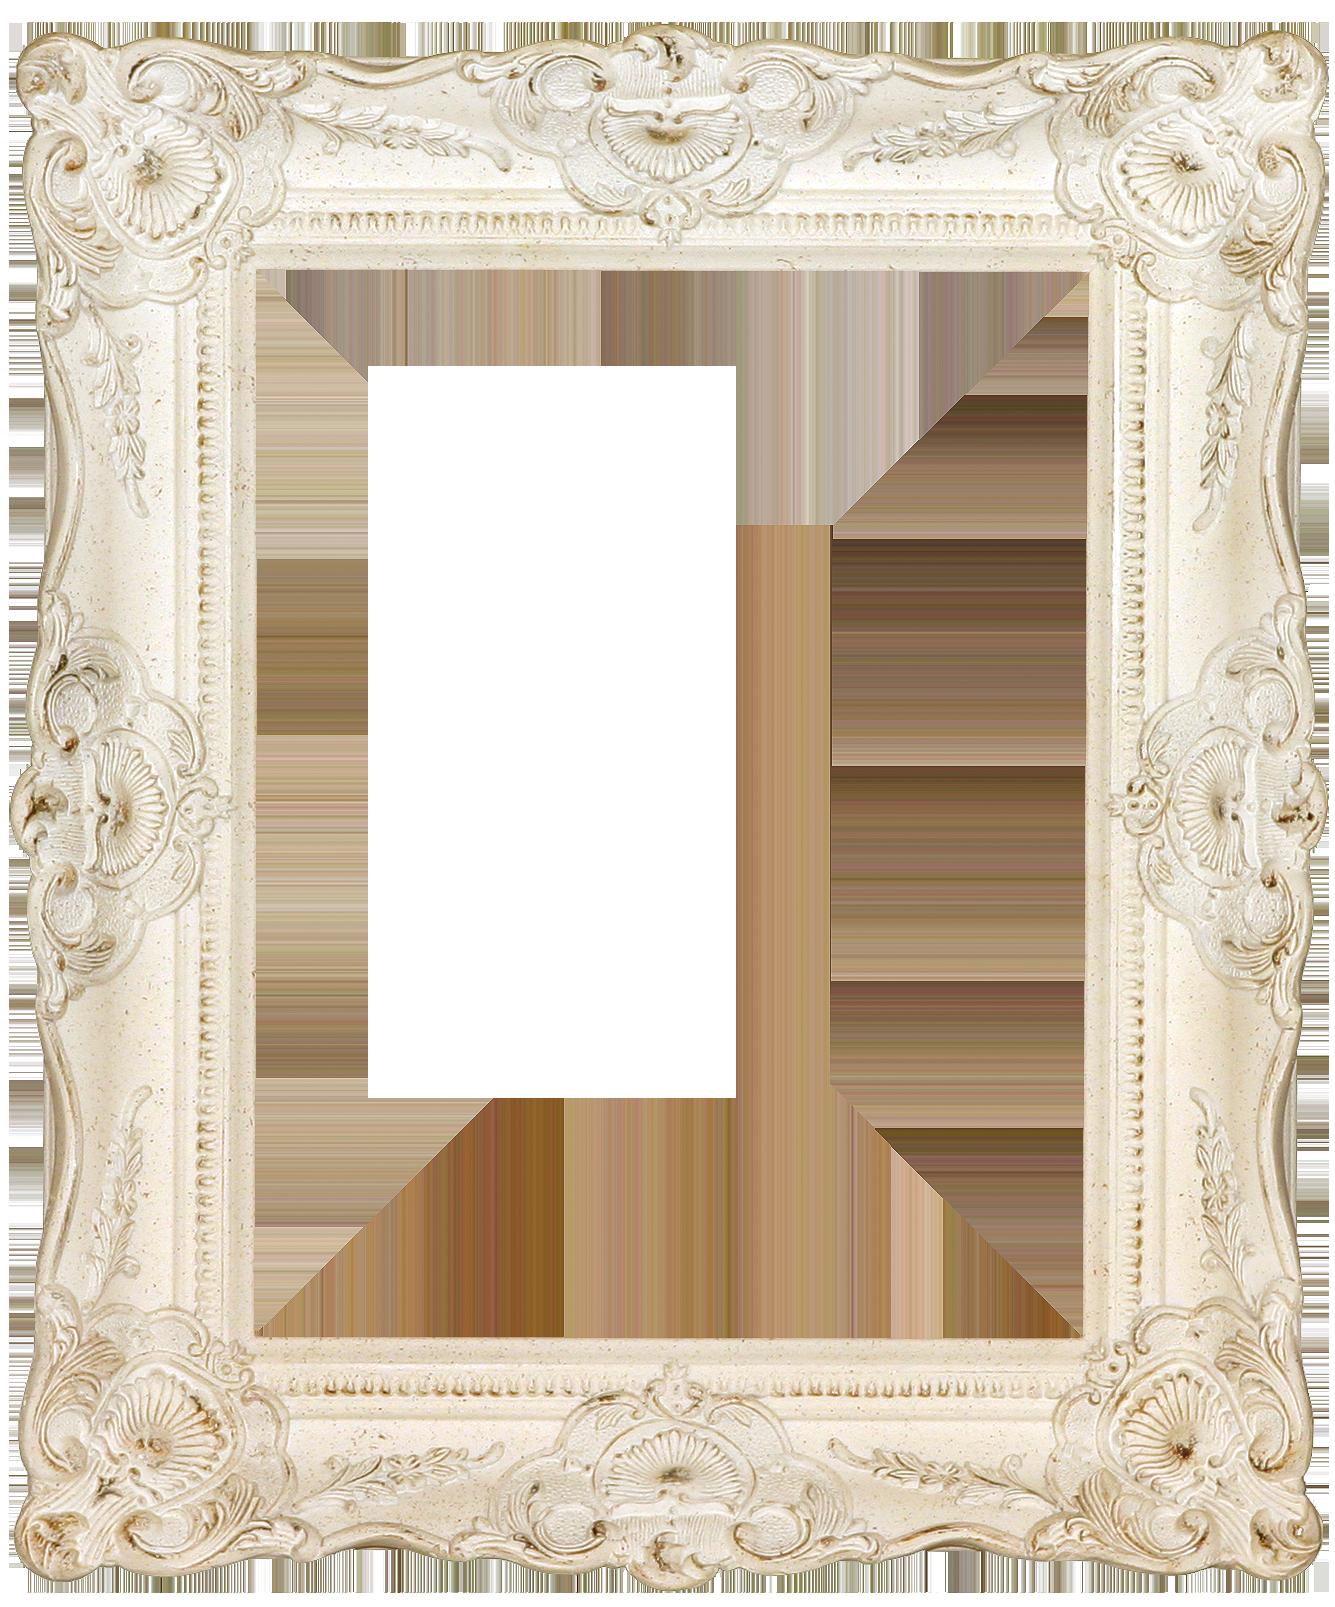 511-zoom.png (1335×1607) Www.kendallhartcraft.com Readymade frame ...